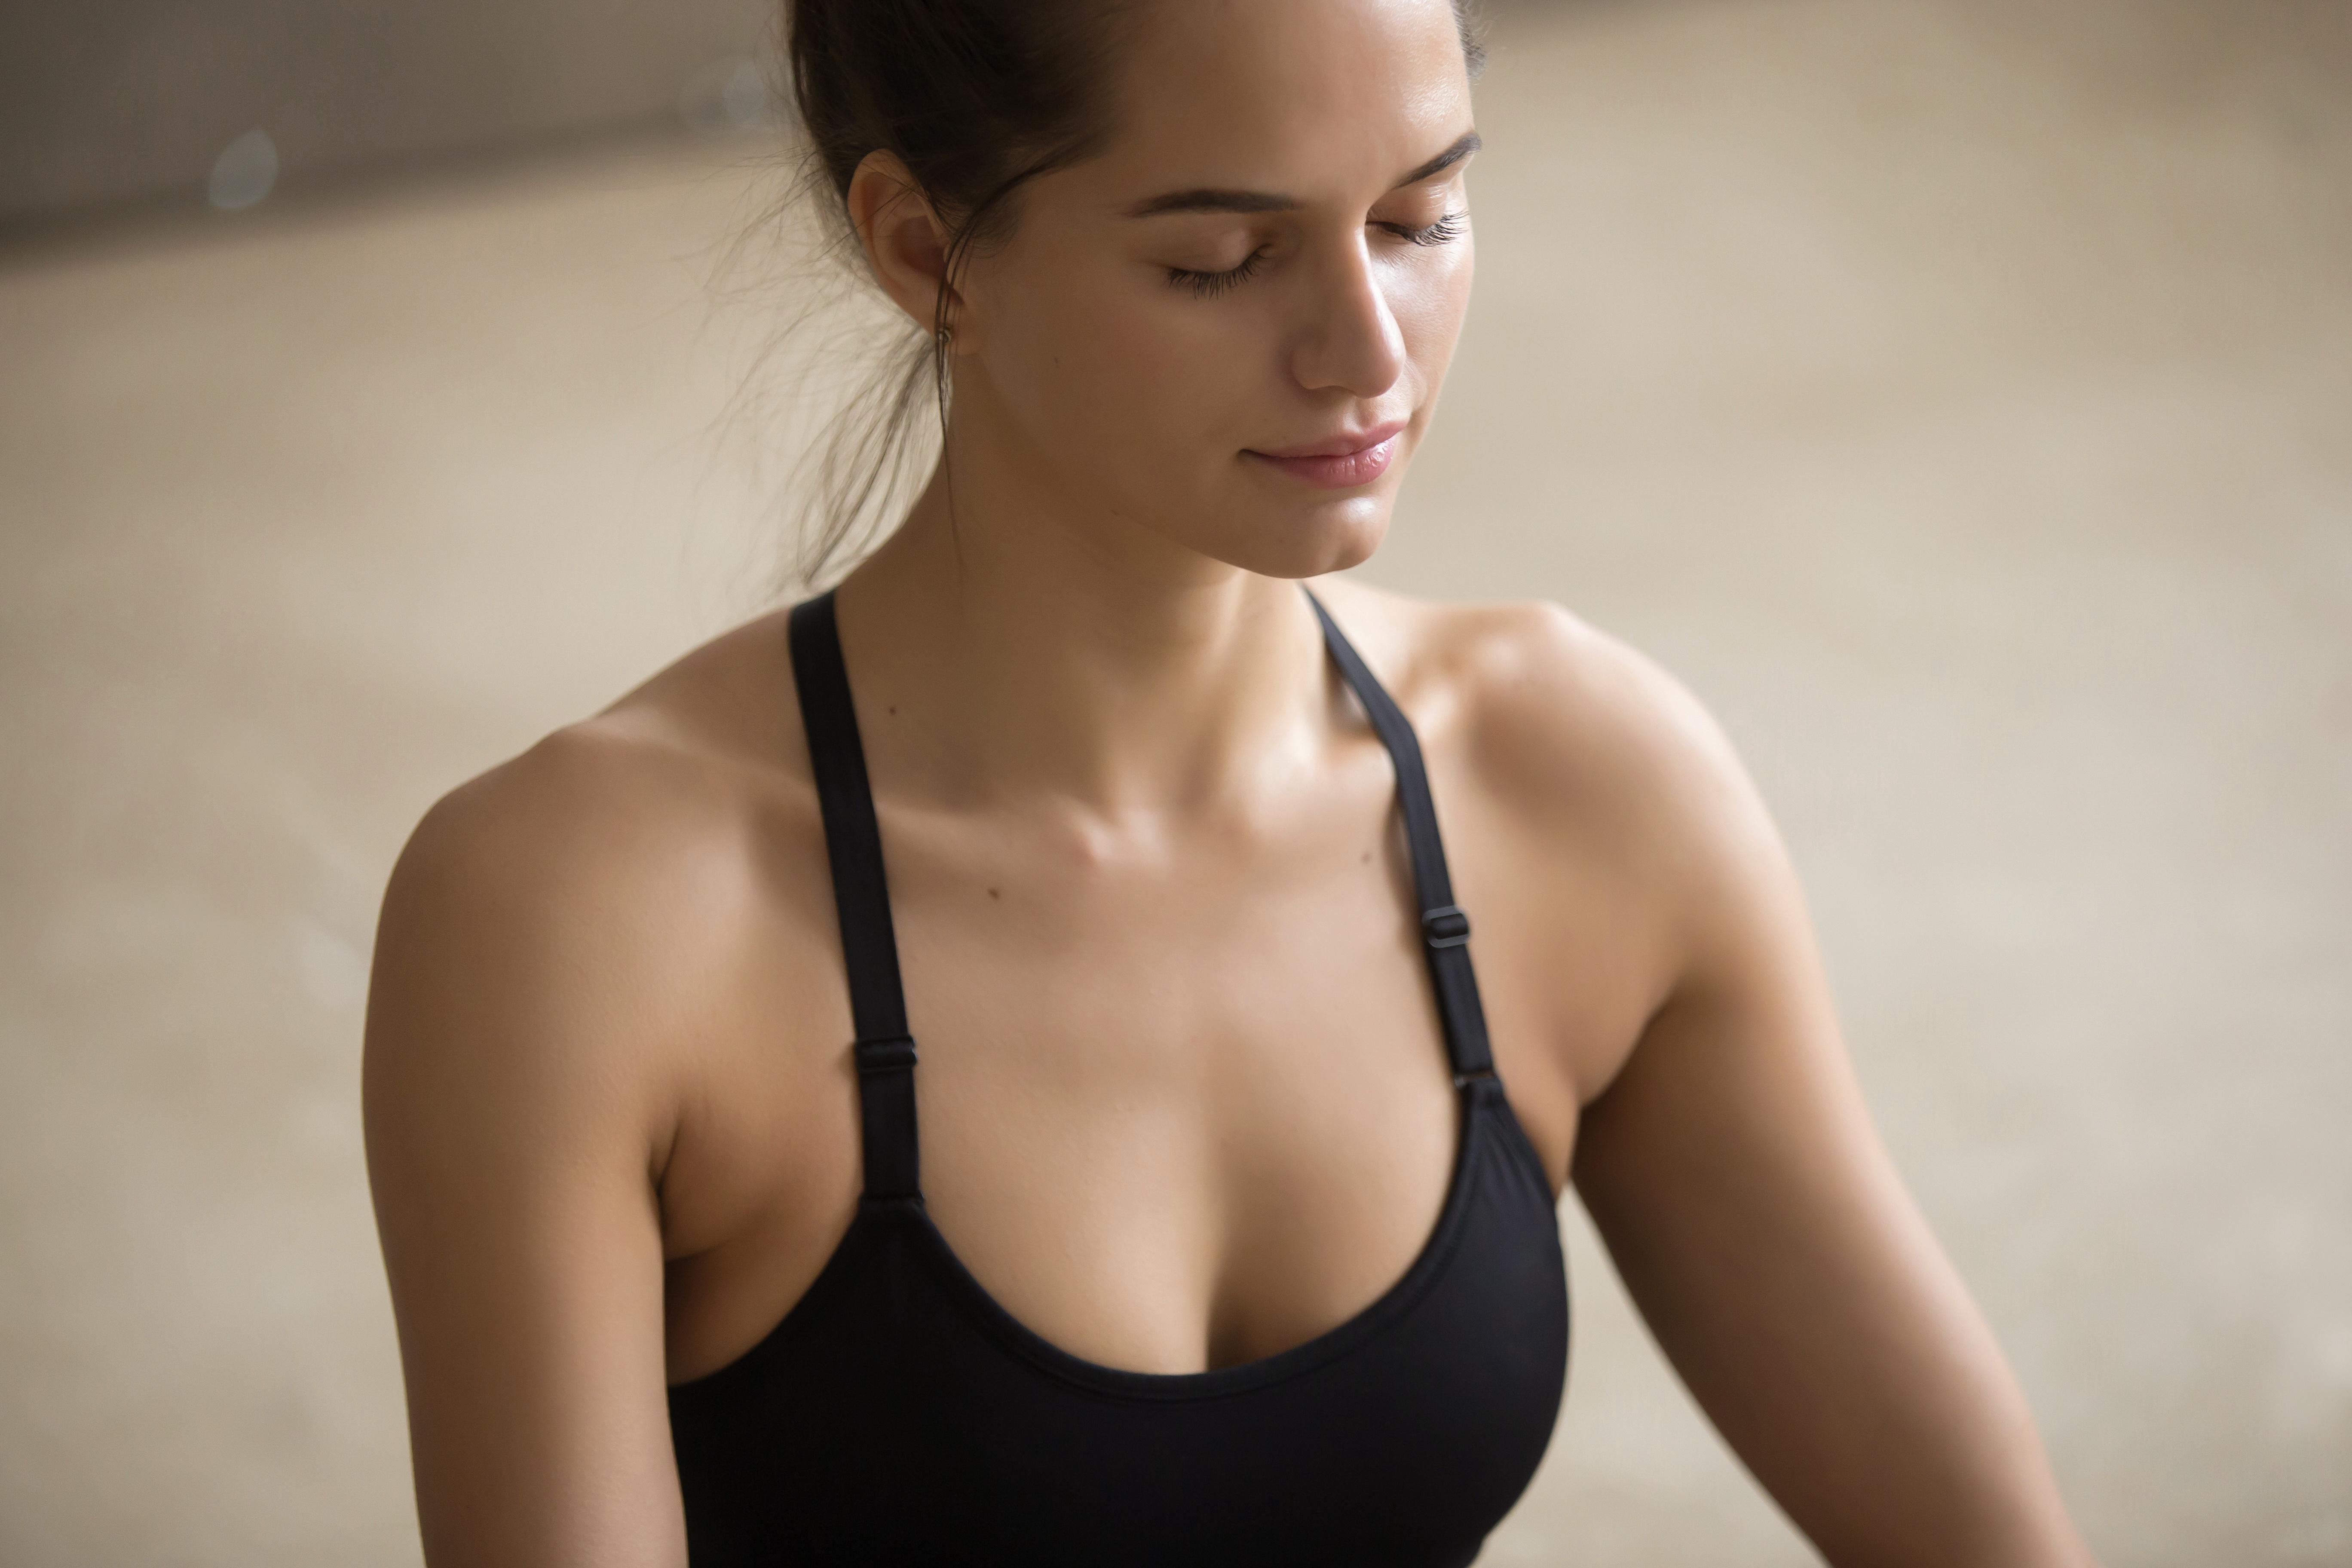 Breathing techniques & skincare: Deep ujjayi breath